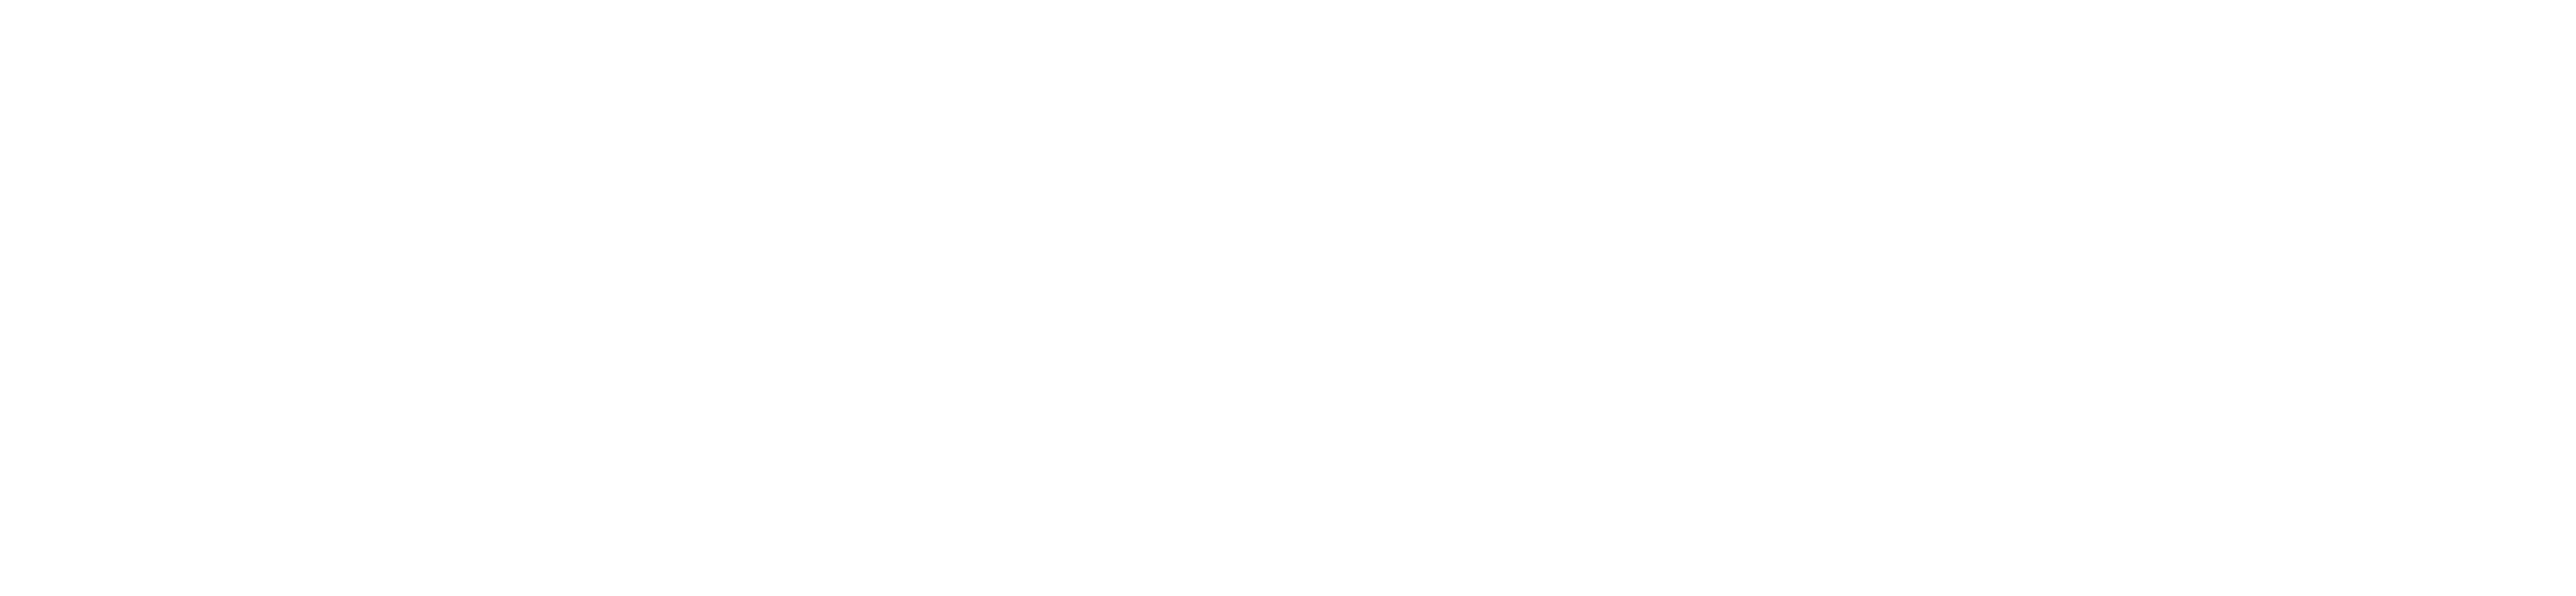 RCF_logo_white_v7